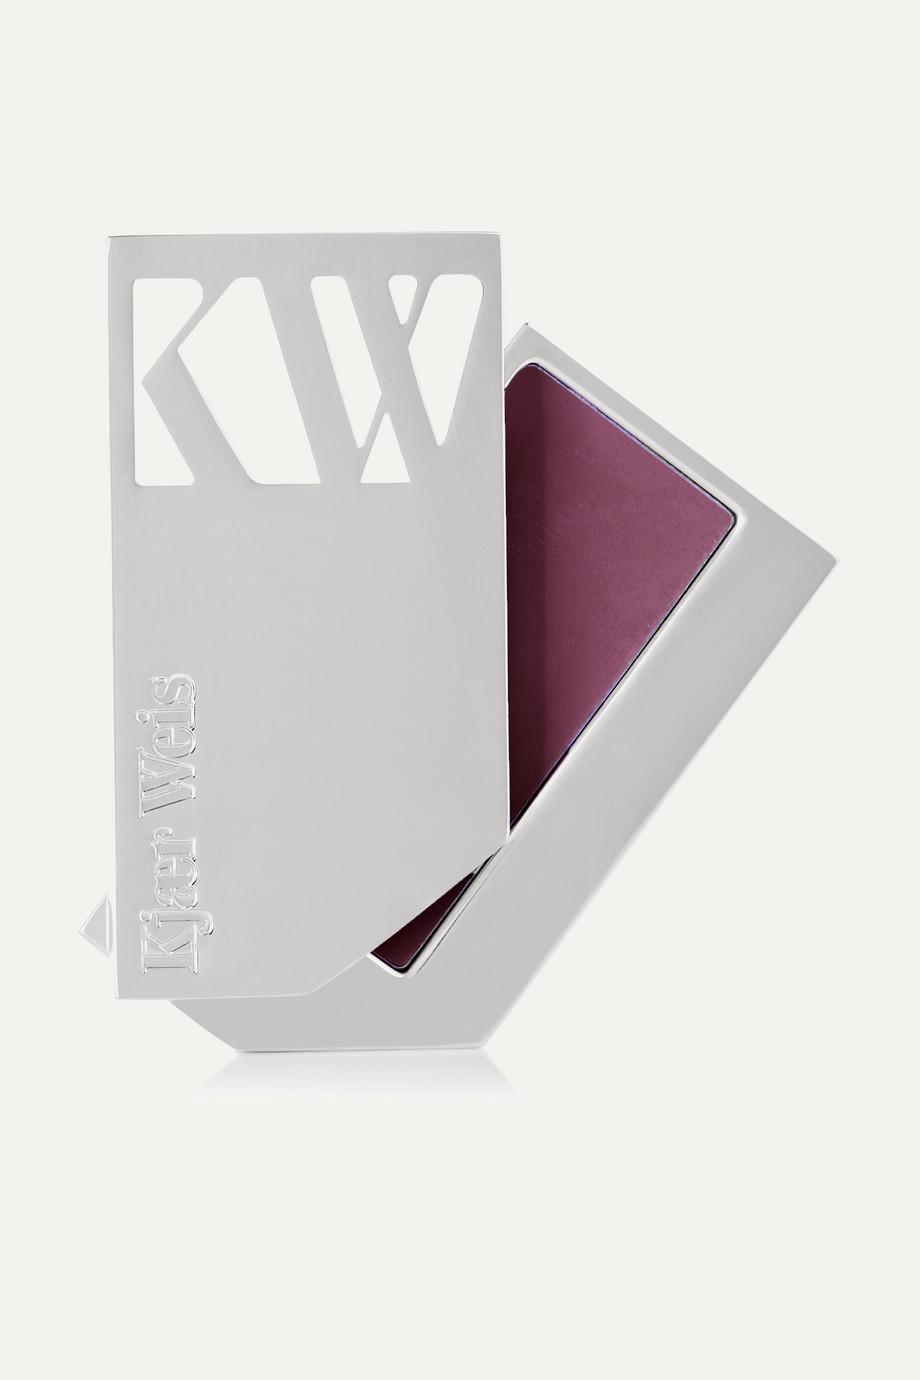 Kjaer Weis Lip Tint - Goddess